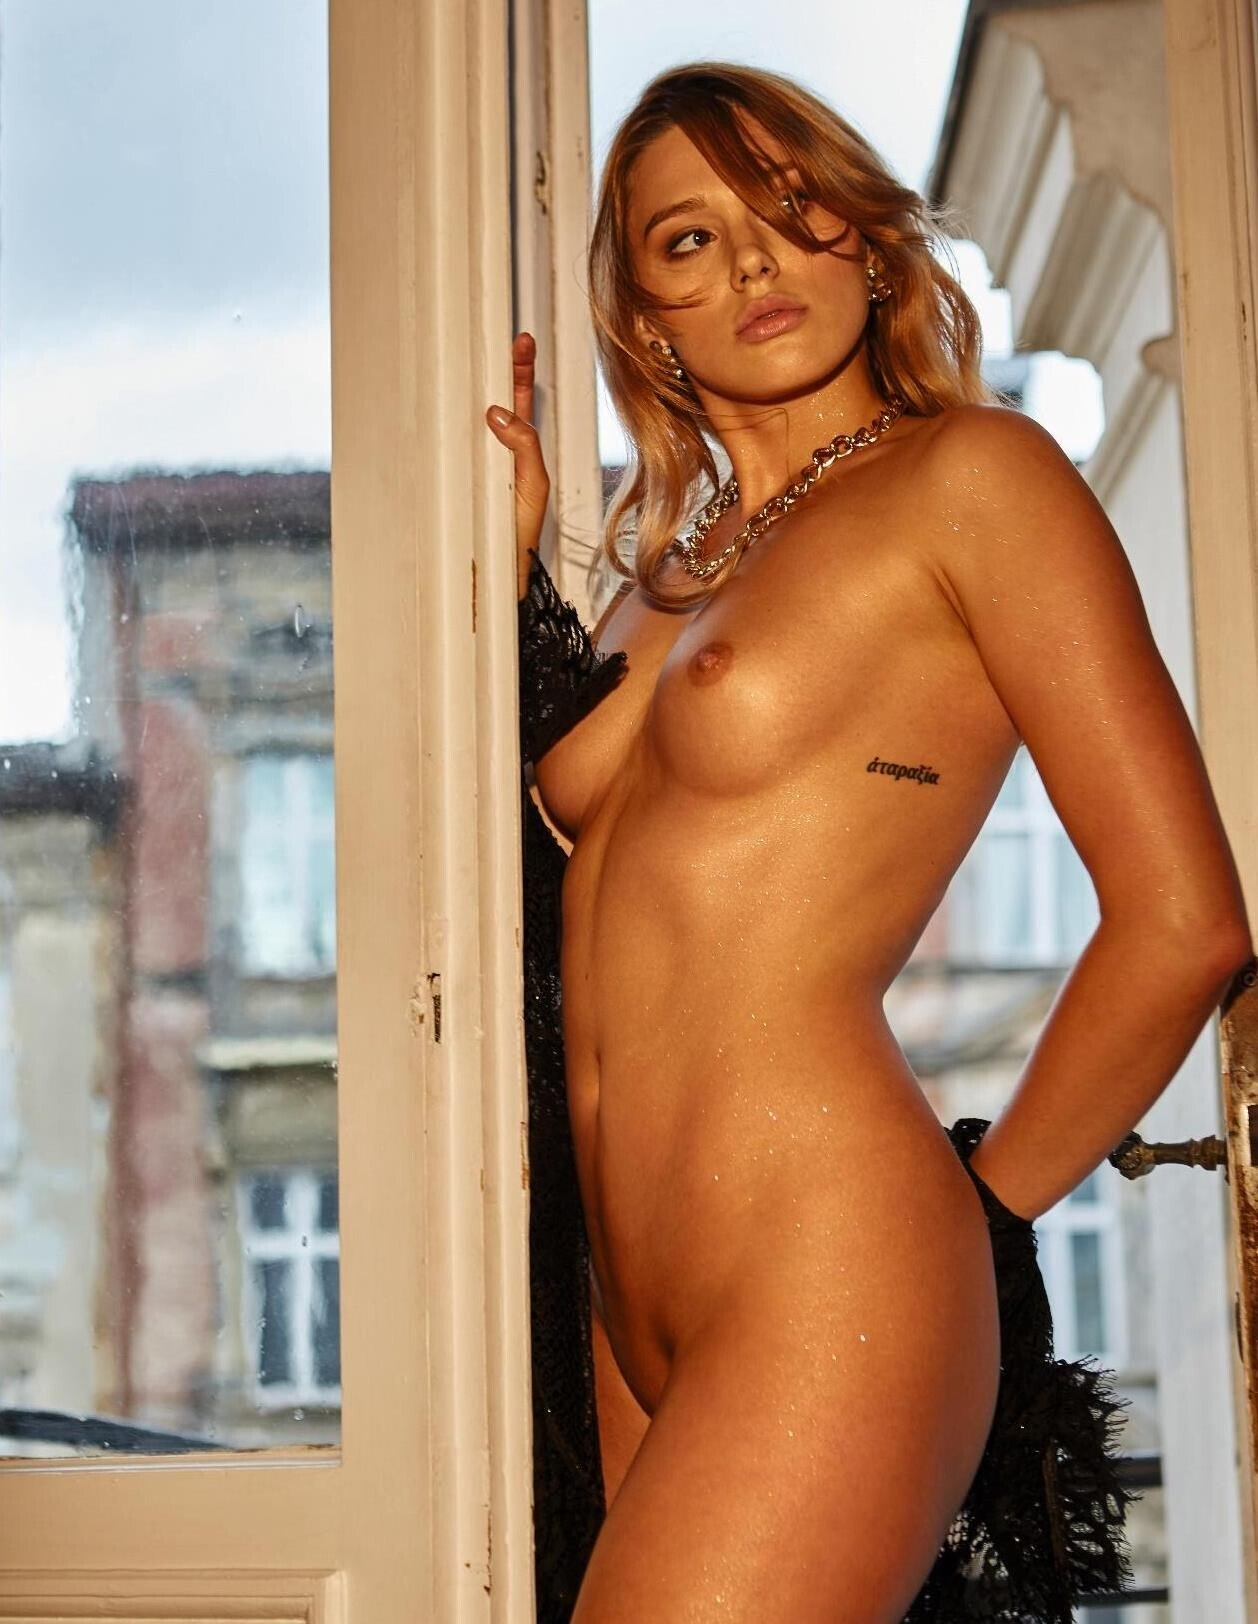 Lena Bednarska - Marzena Bukowska-Filuk (Playboy) photoshoot